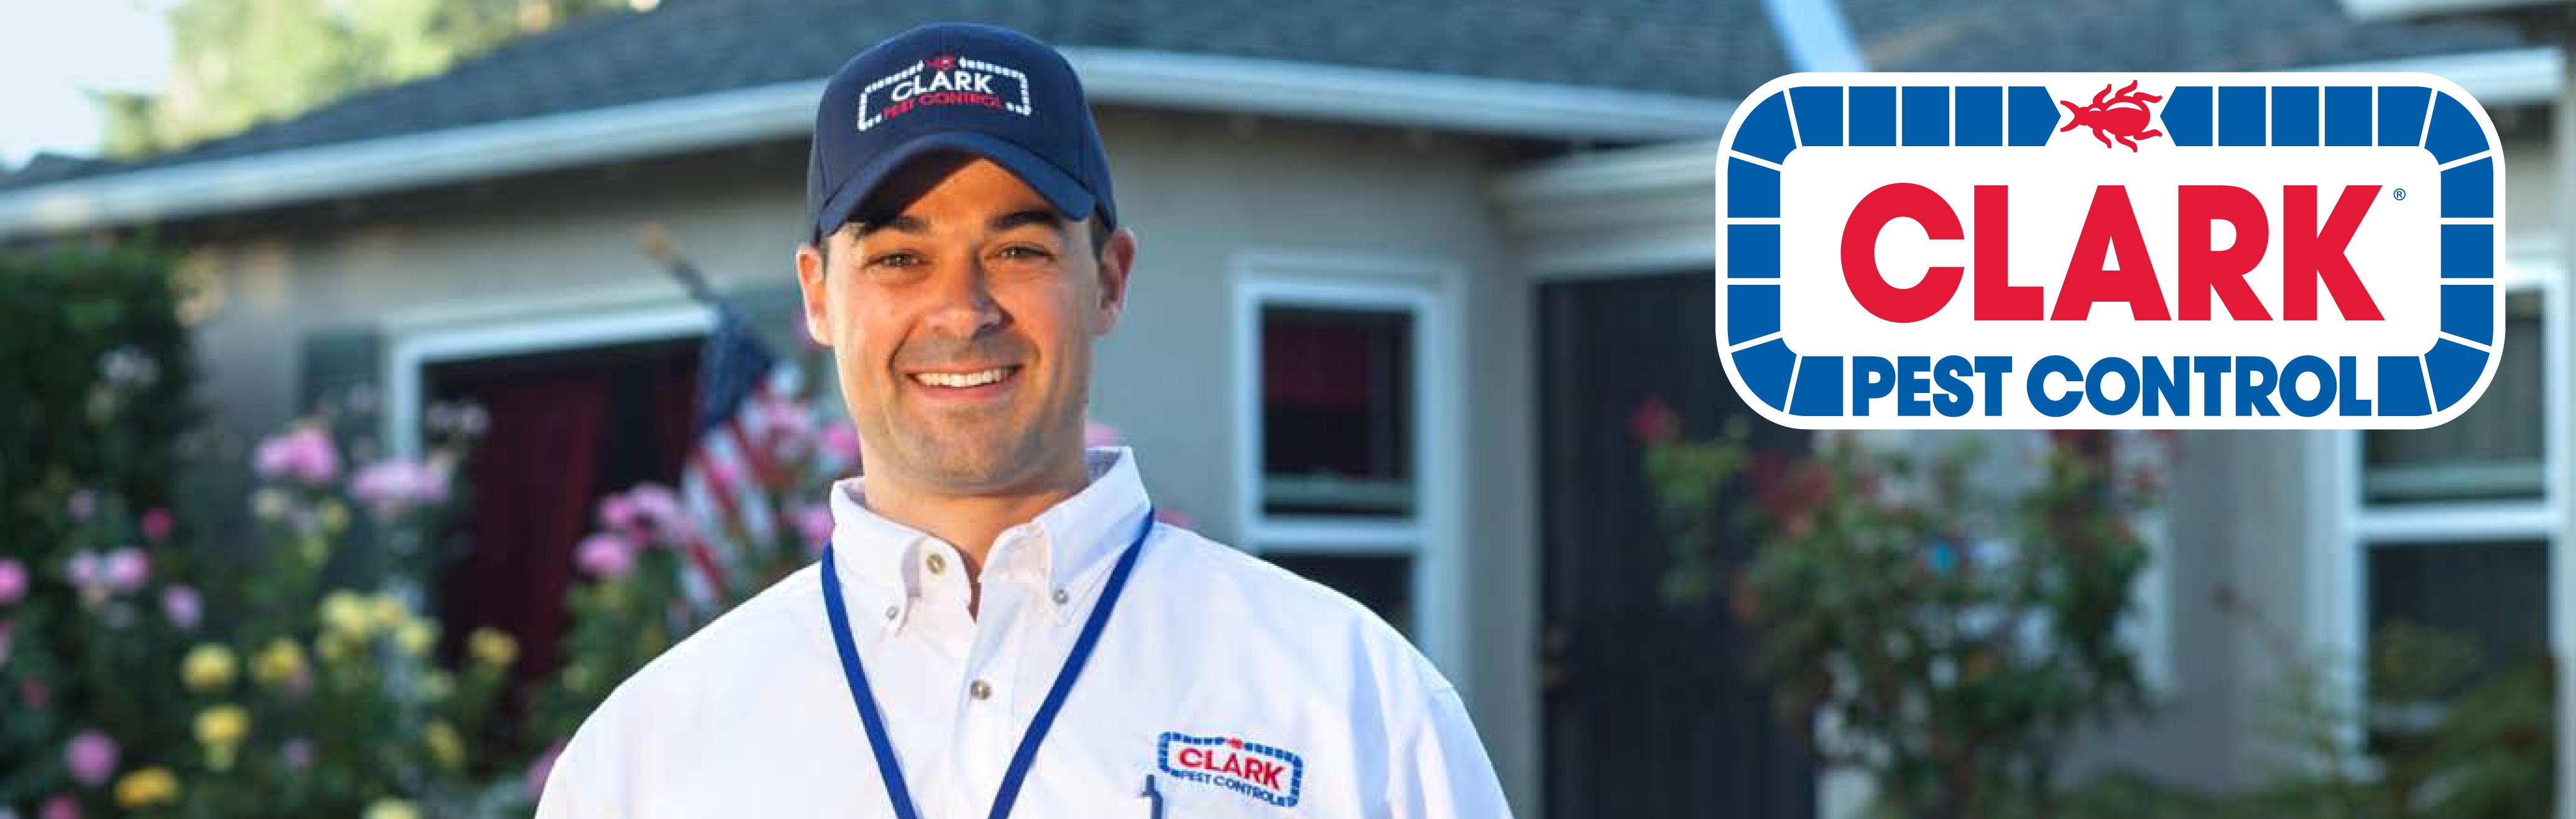 Clark Pest Control reviews | Home & Garden at 429 East Mono Way - Sonora CA